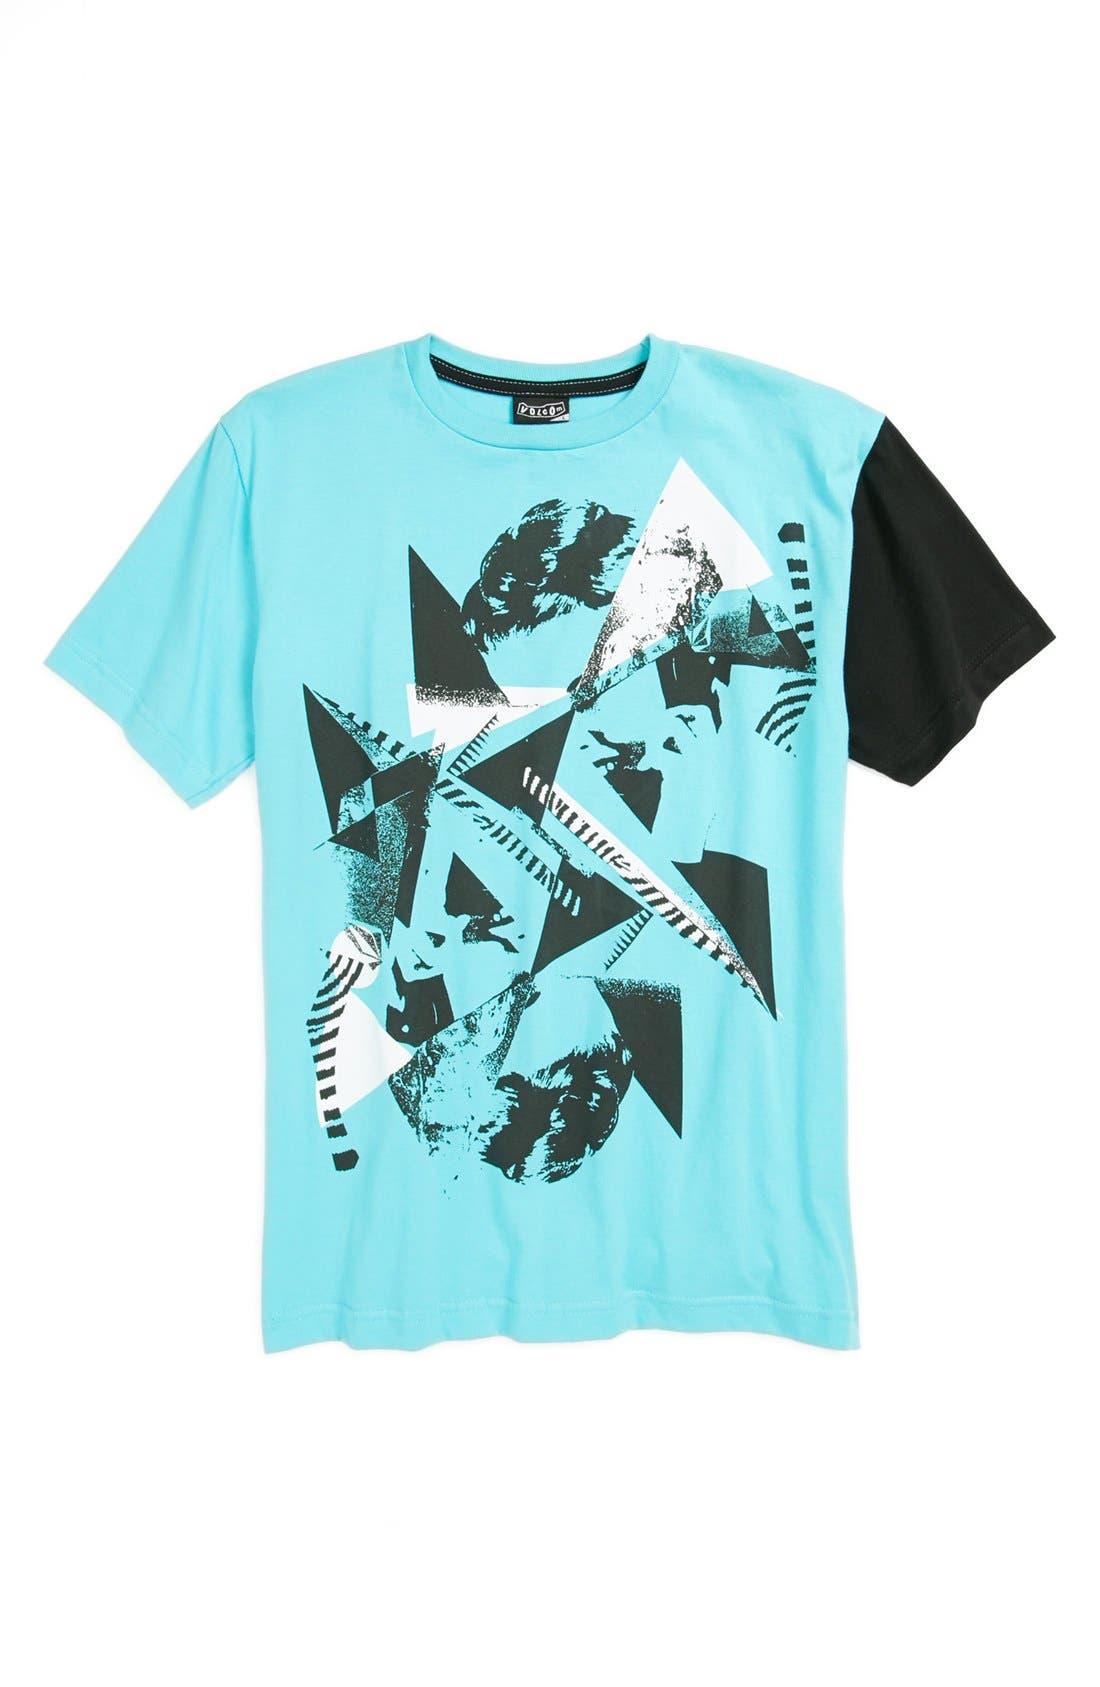 Alternate Image 1 Selected - Volcom 'Trichoto' T-Shirt (Big Boys)